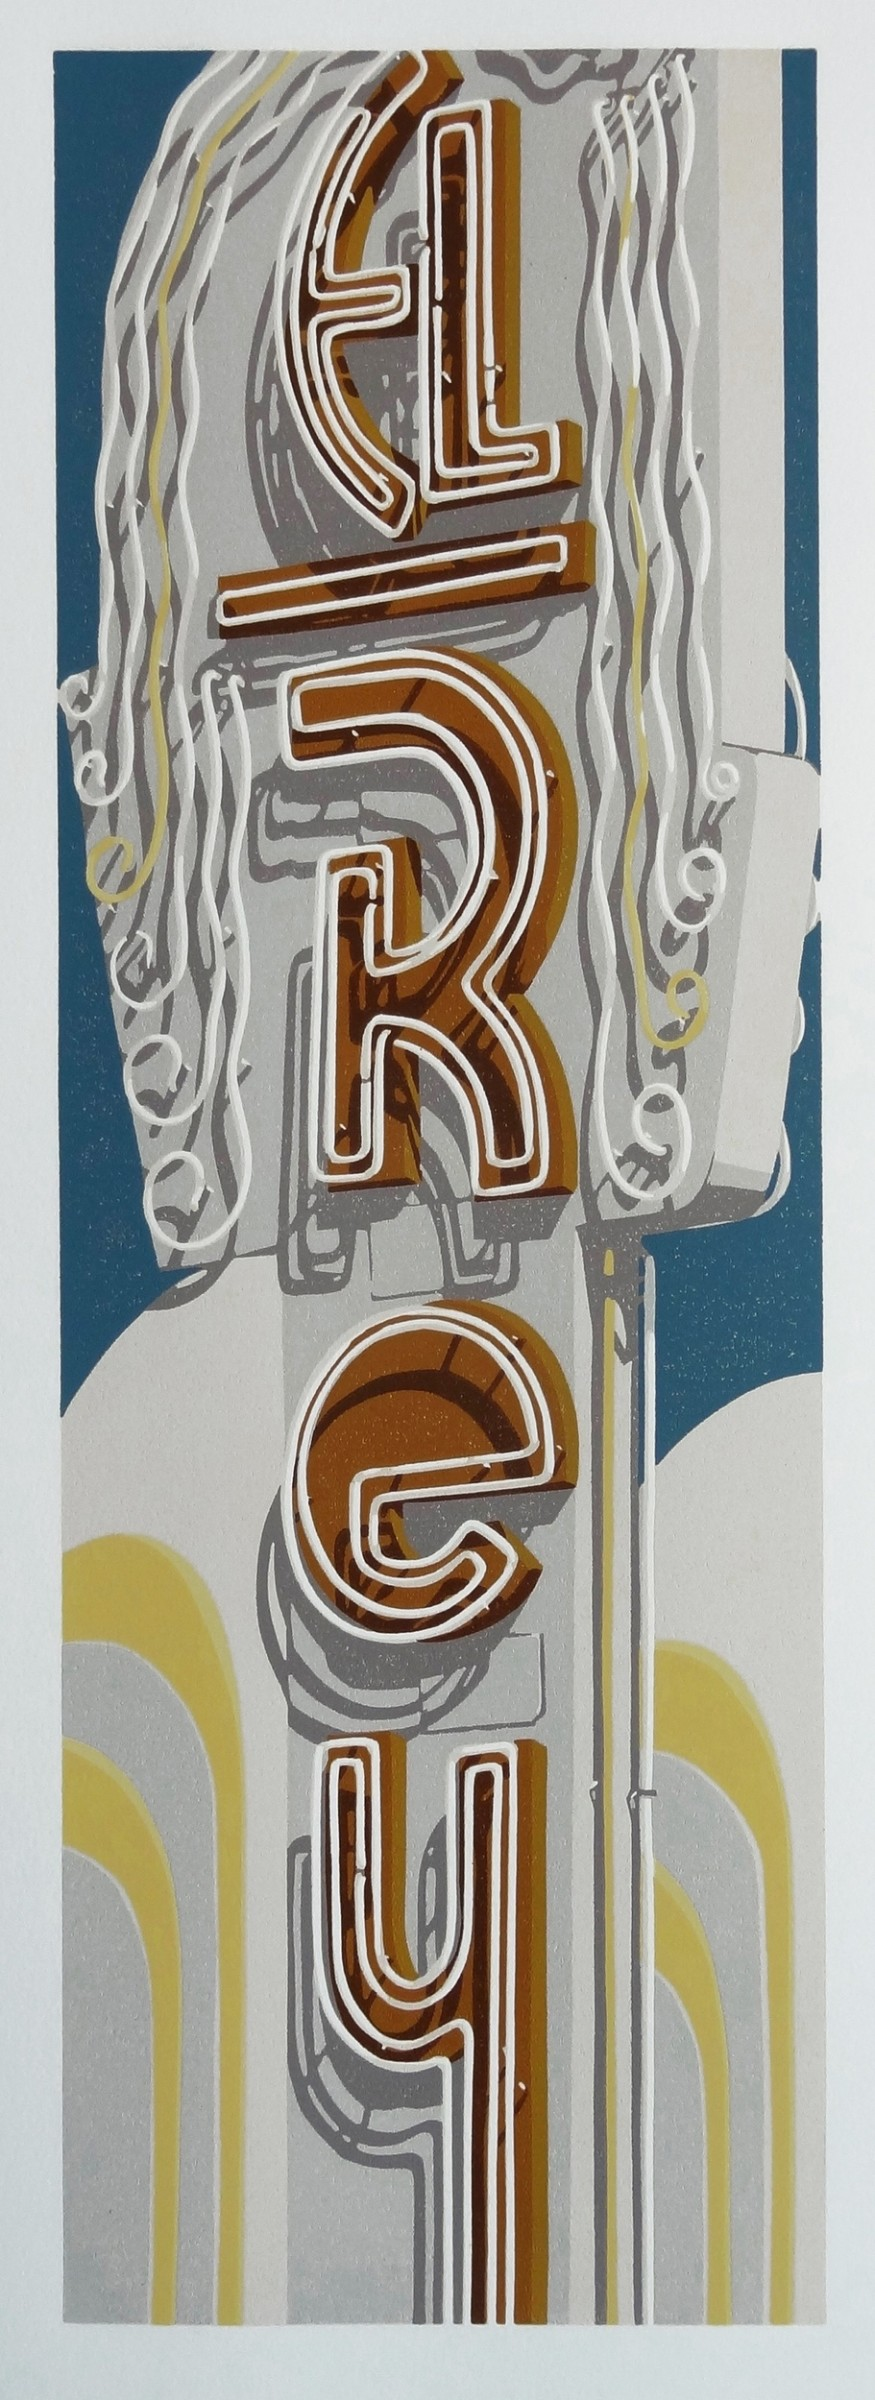 "<span class=""link fancybox-details-link""><a href=""/exhibitions/18/works/image_standalone1020/"">View Detail Page</a></span><p>Dave Lefner</p><p>El Rey Theatre</p><p>linocut</p><p>77 x 36cm</p><p>£2100 framed</p><p>£1800 unframed</p>"